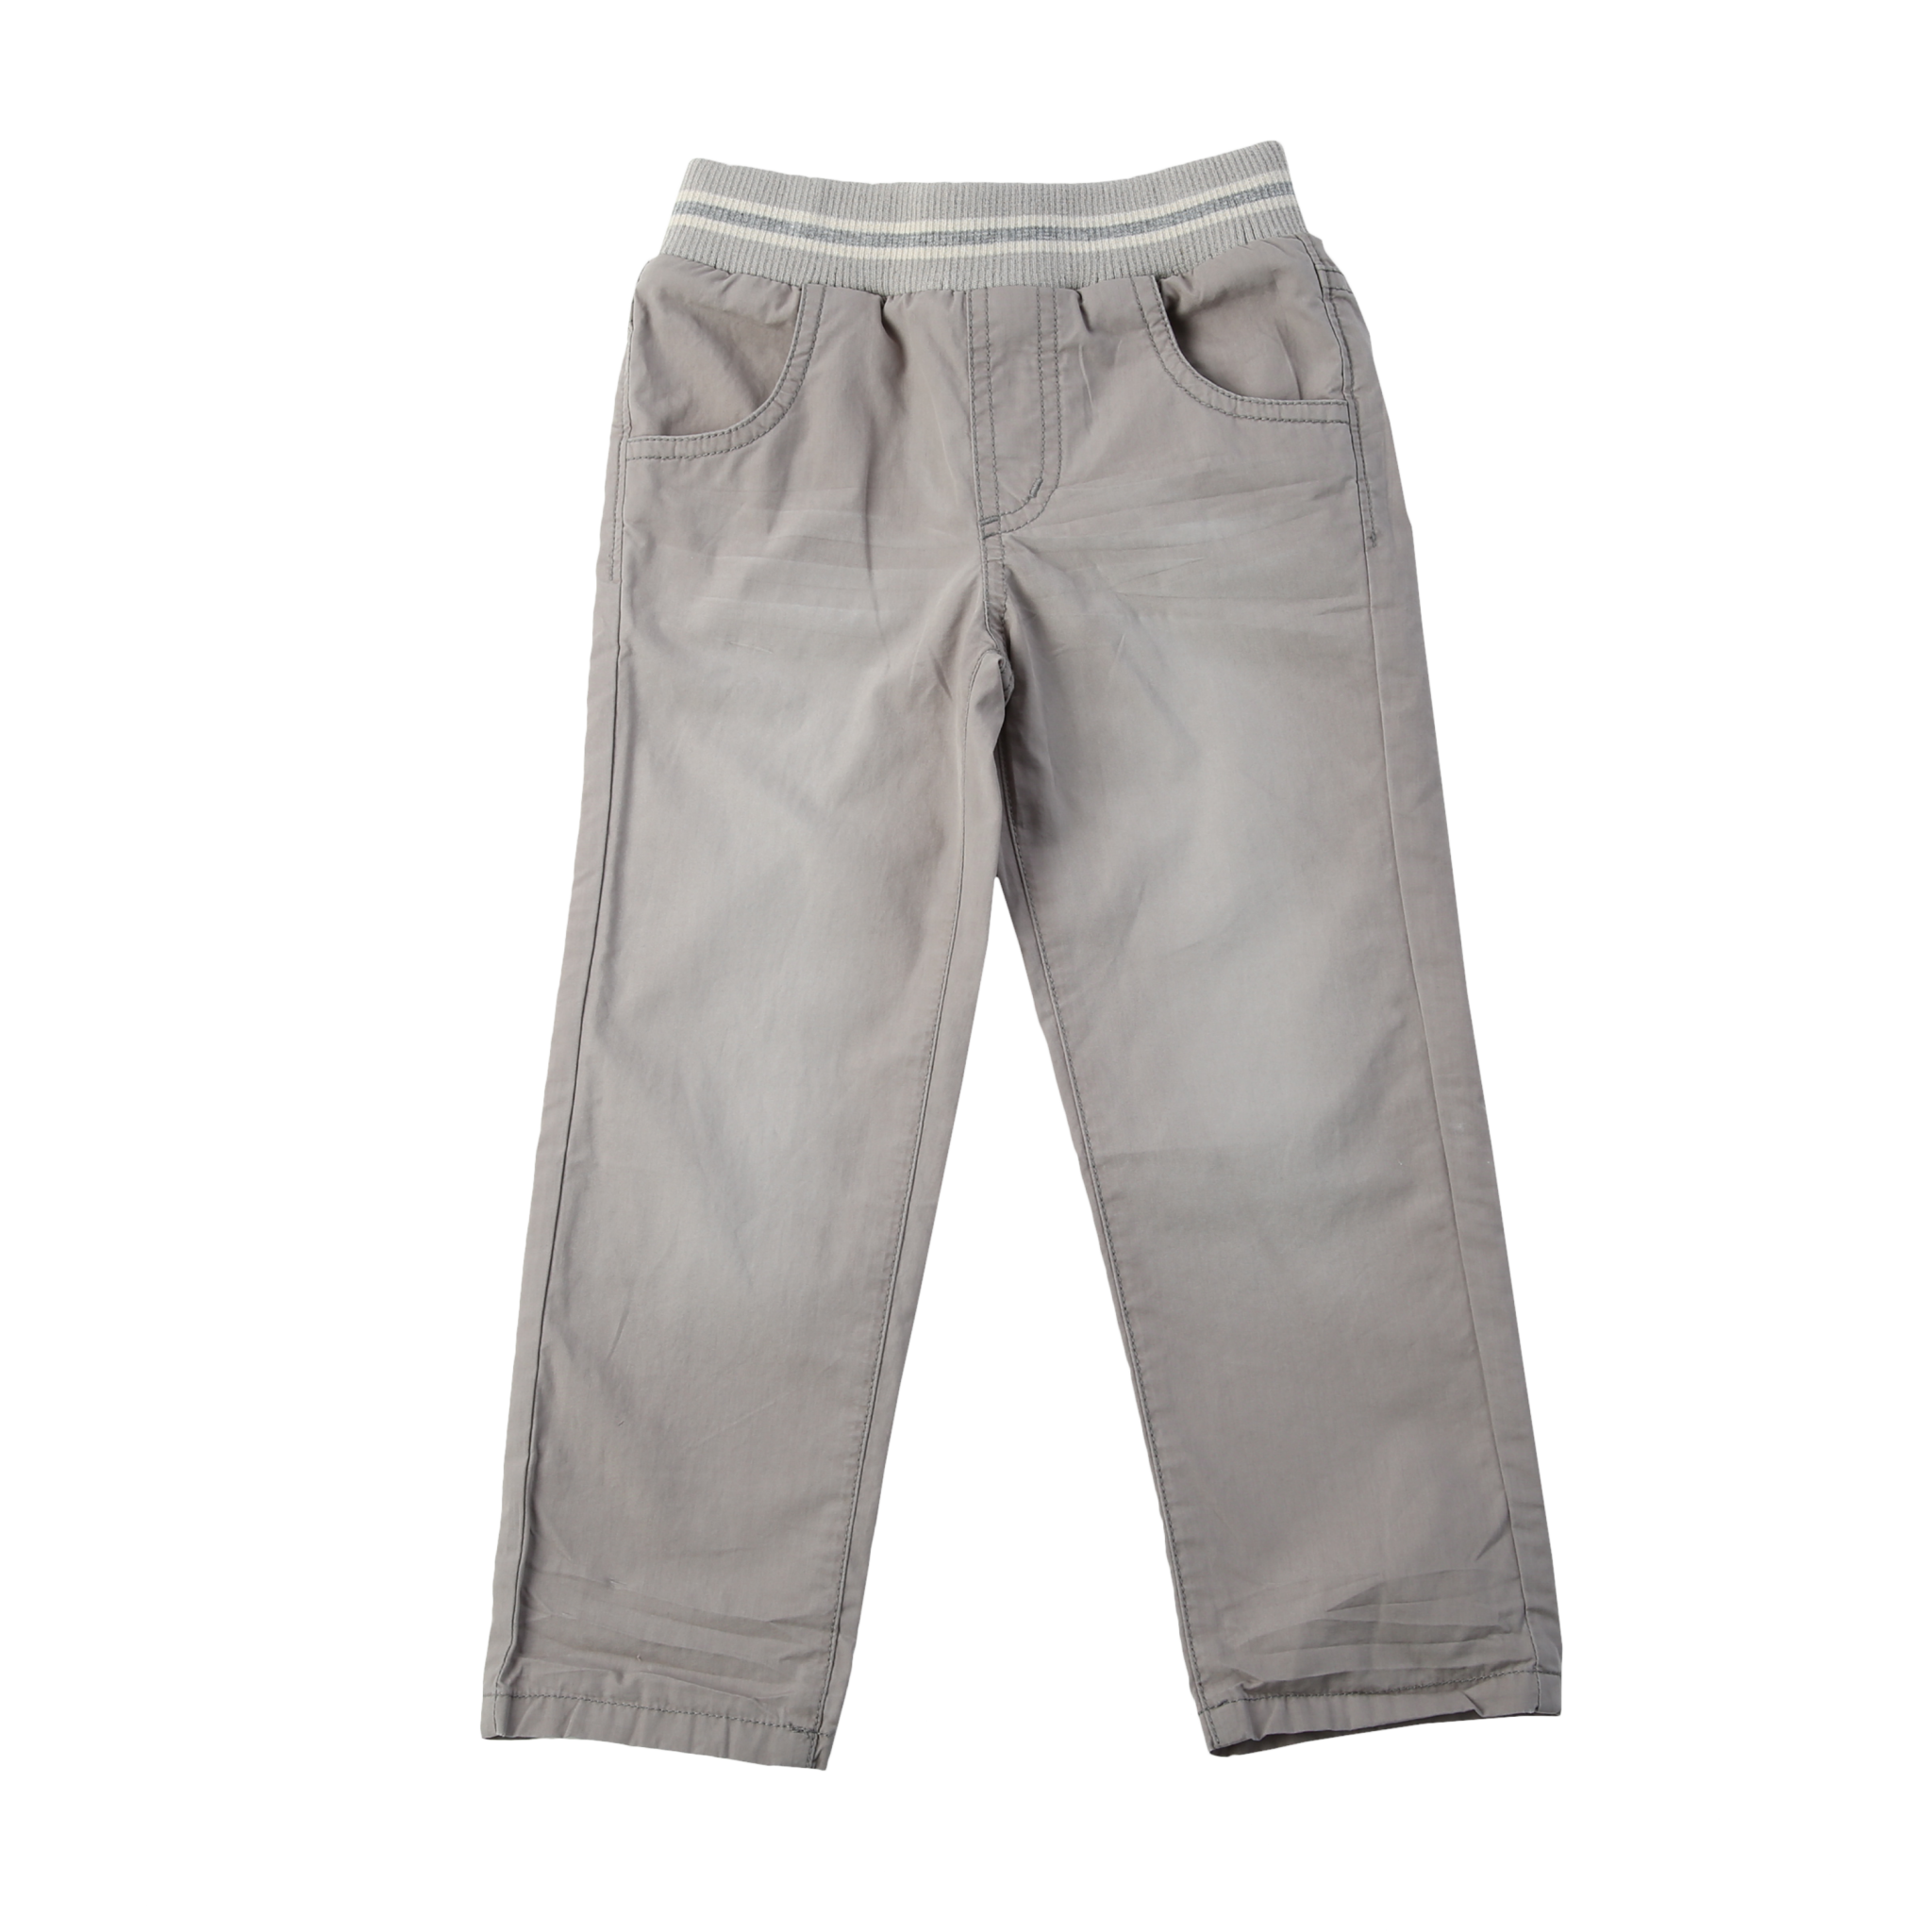 Khaki Pants PNG Transparent Khaki Pants.PNG Images.   PlusPNG